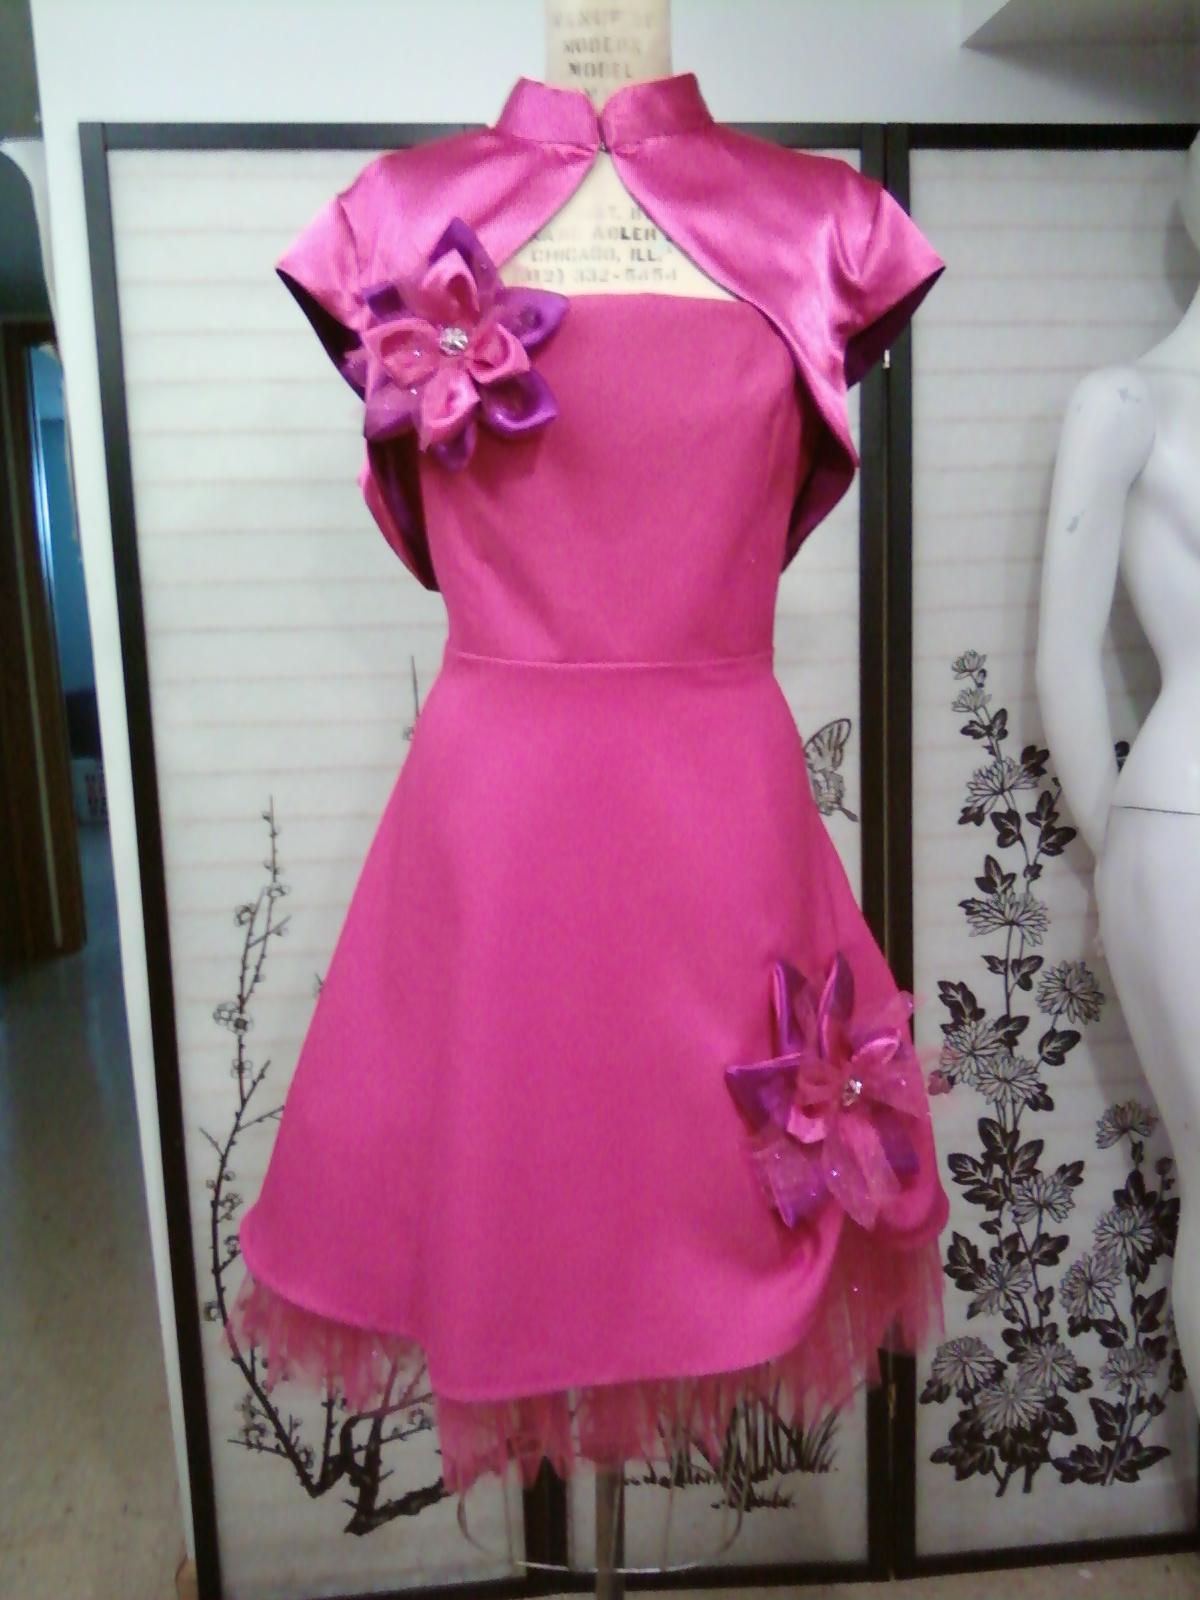 2011 Curvy Girl Prom Dress Challenge | Sew Chicago